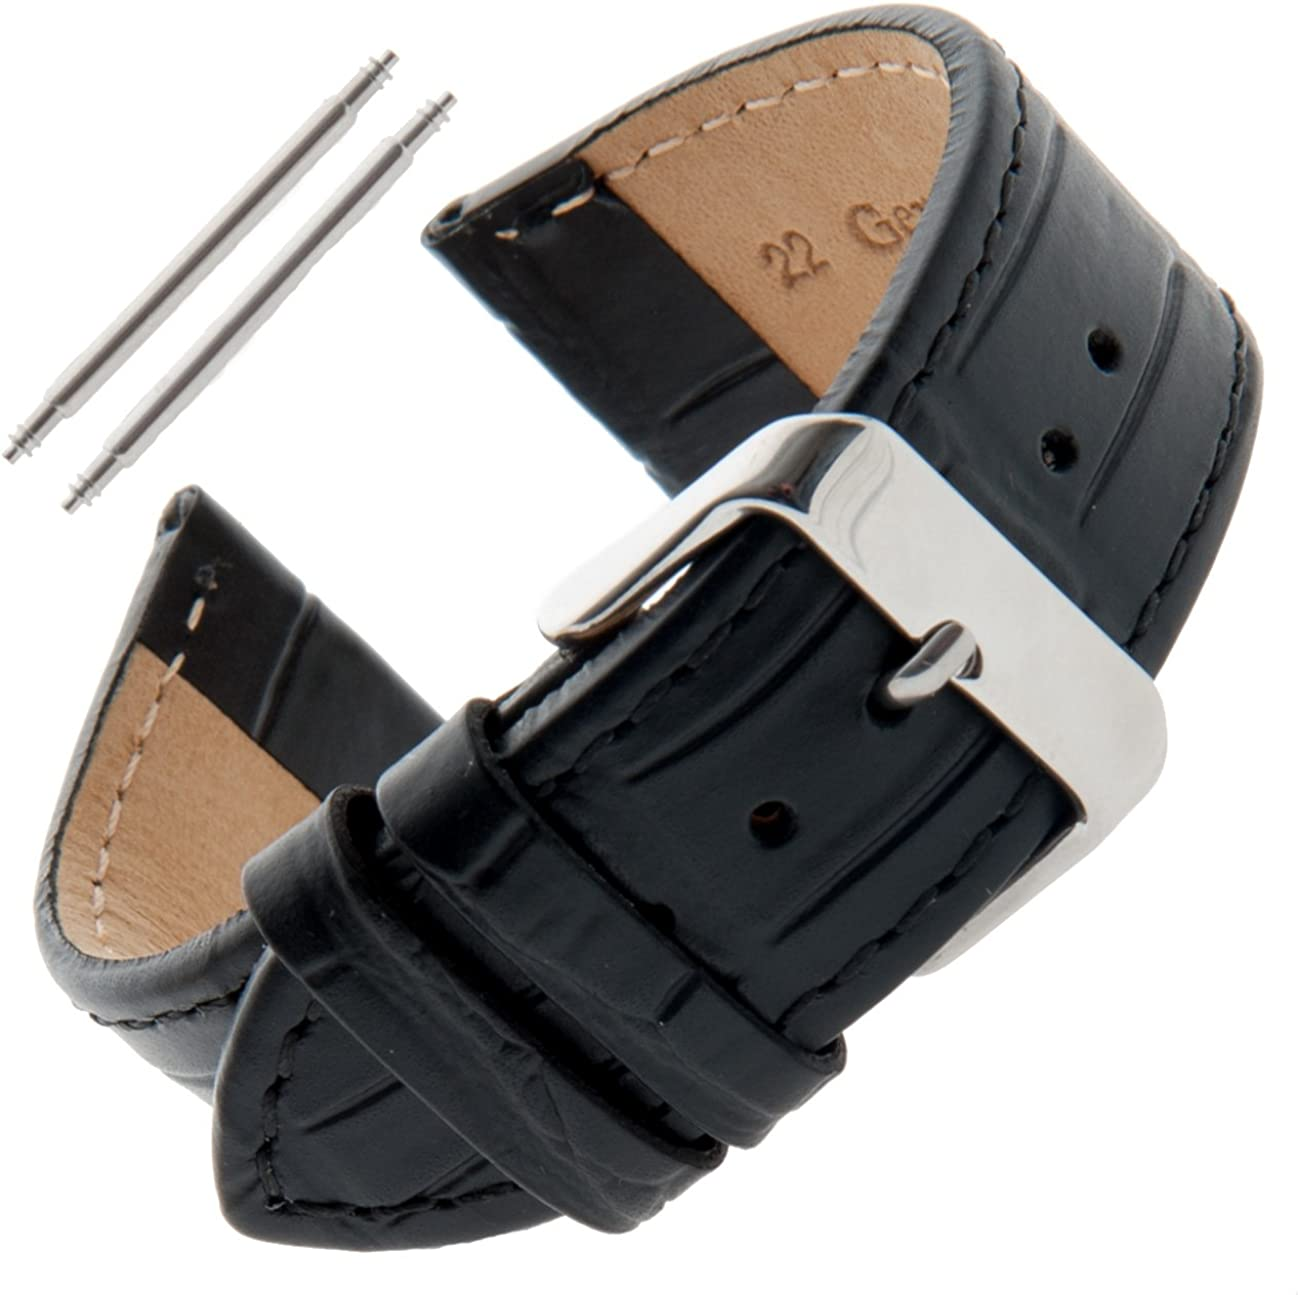 Gilden Unisex 16-30mm Gator-Grain Flat Stitched Leather Watch Strap F30